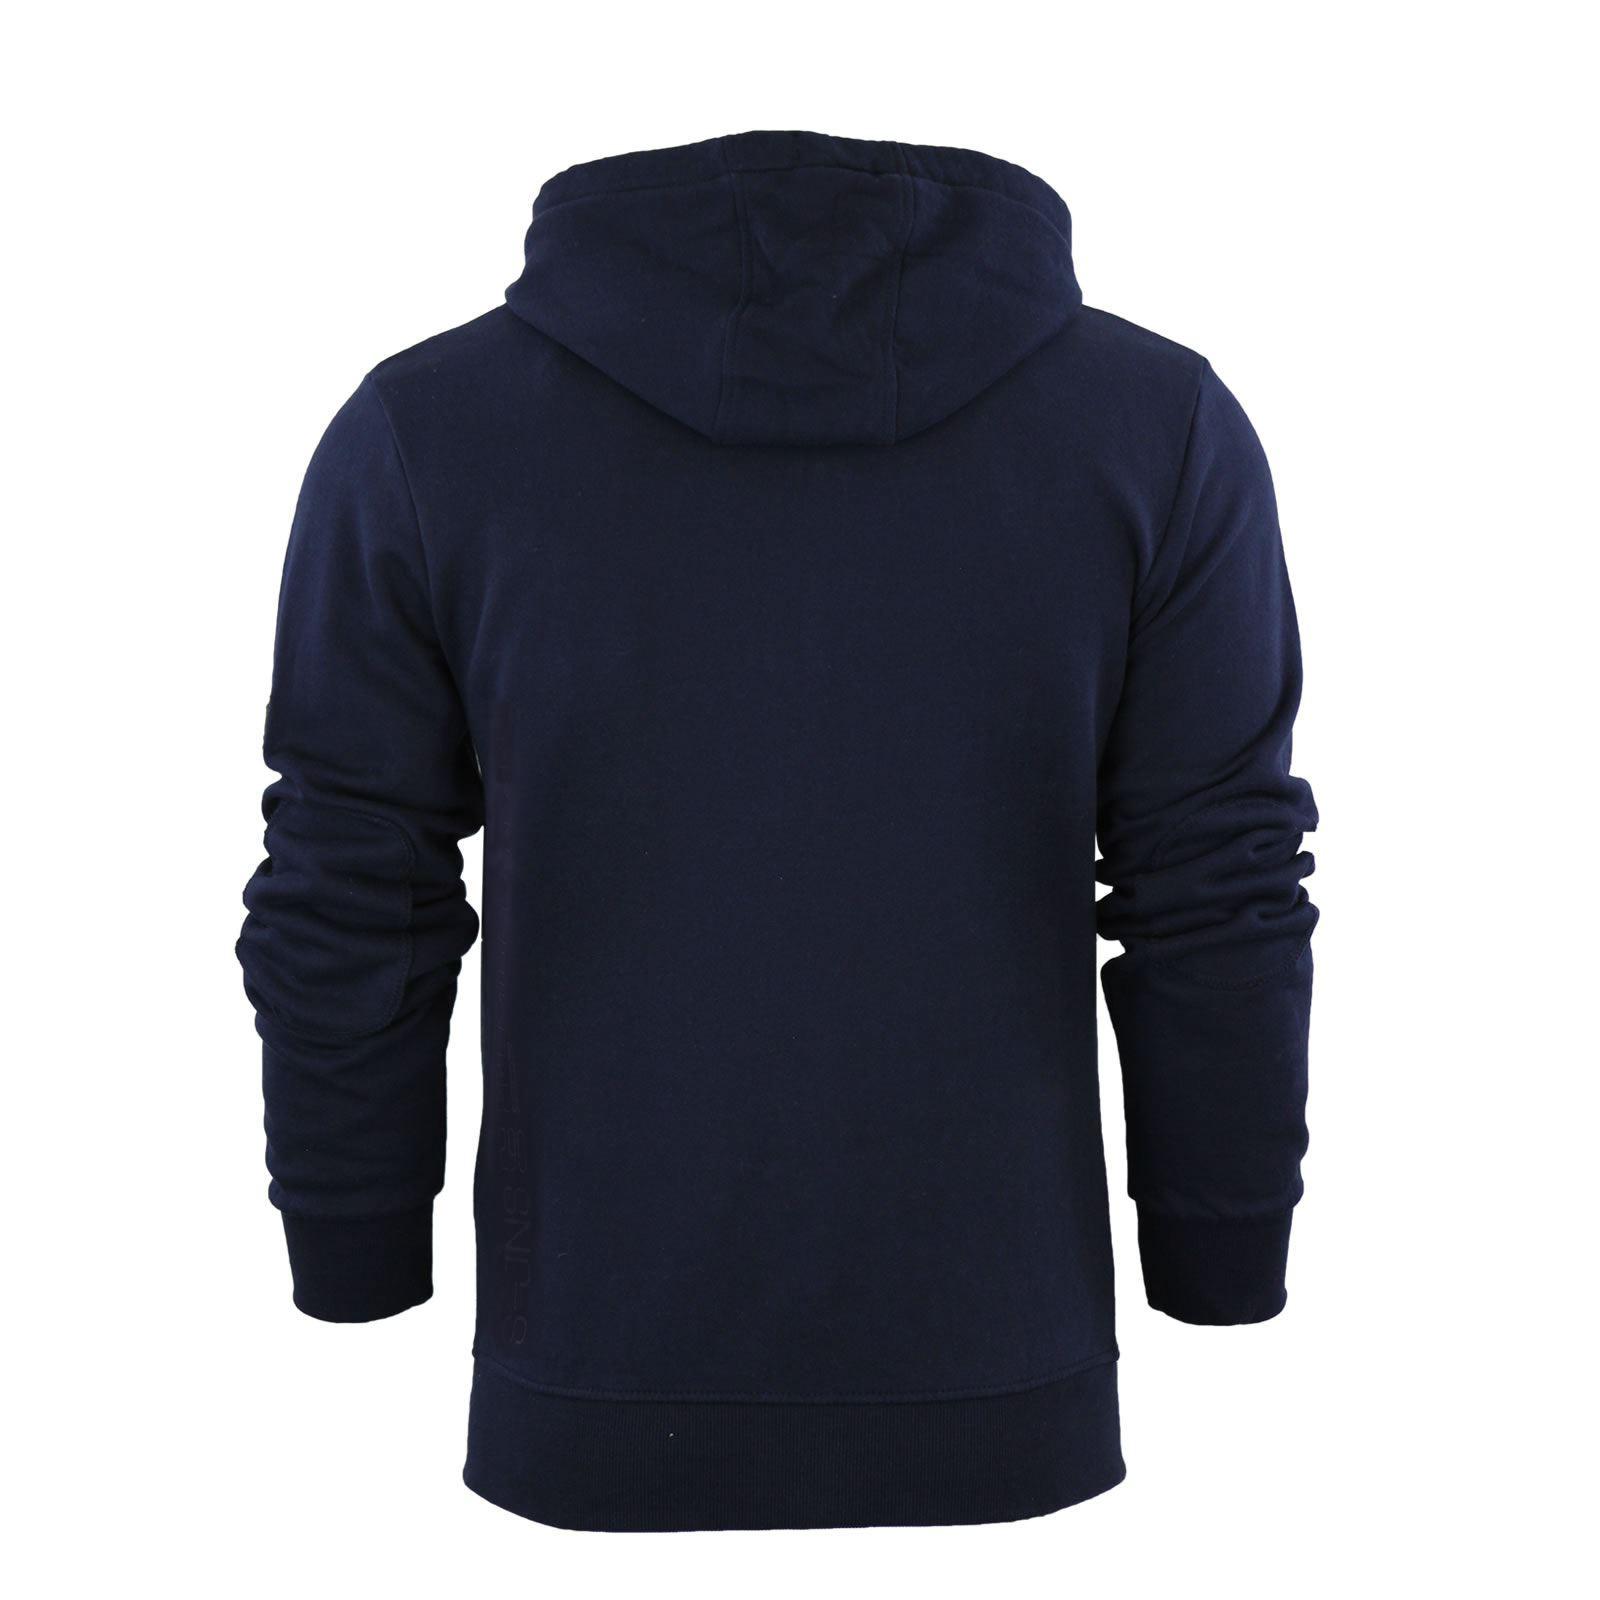 Mens-Hoodie-Smith-amp-Jones-Zip-Up-Hooded-Sweater-Jumper thumbnail 6